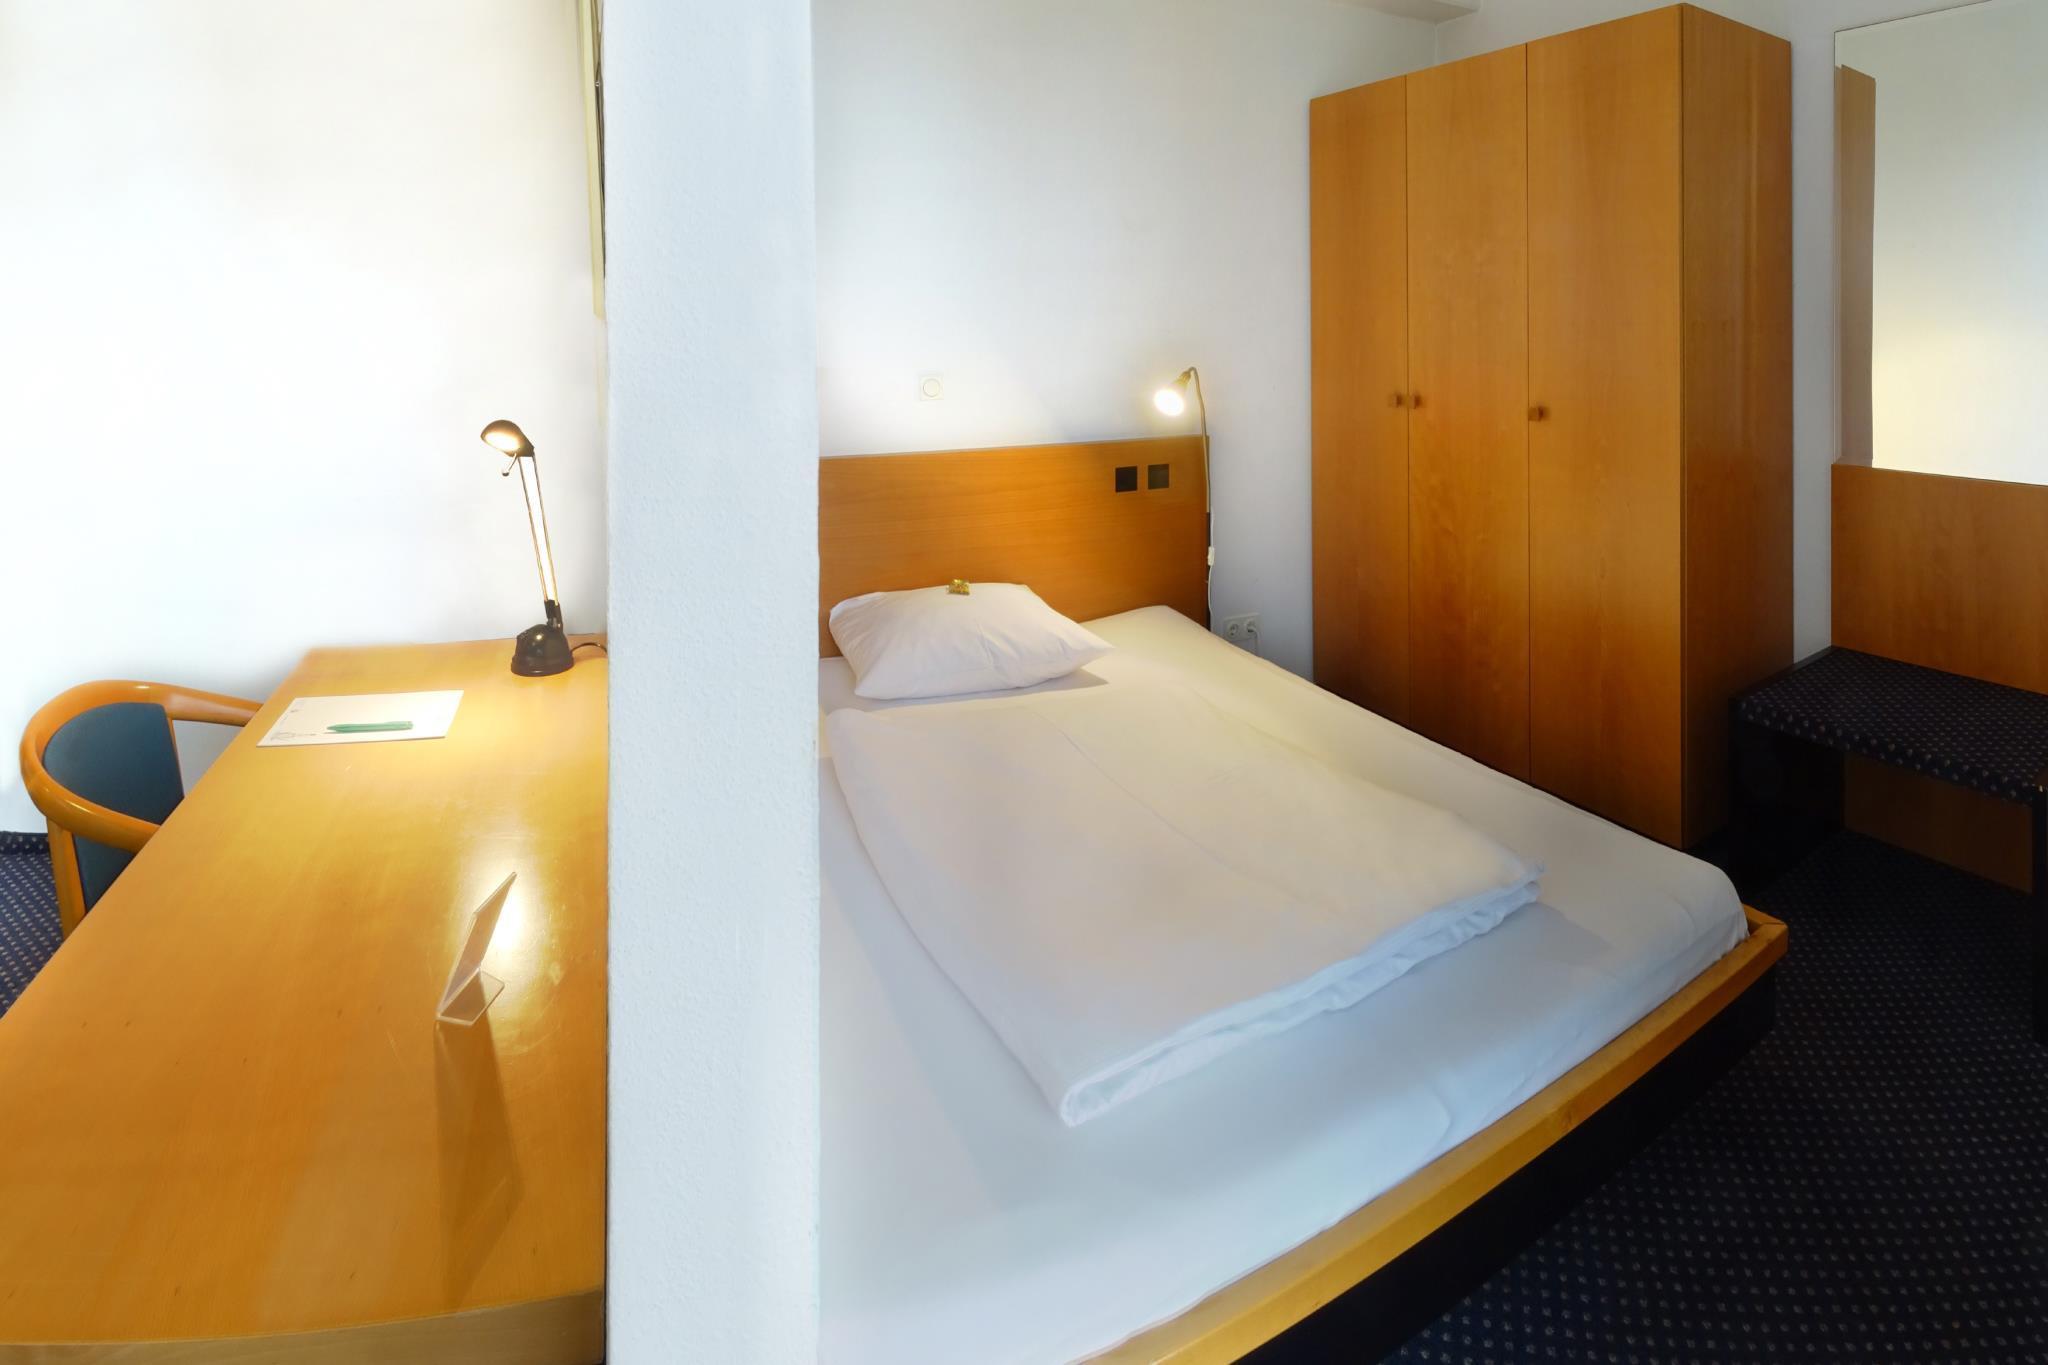 das amedia suites r sselsheim amedia suites ruesselsheim in r sselsheim buchen. Black Bedroom Furniture Sets. Home Design Ideas